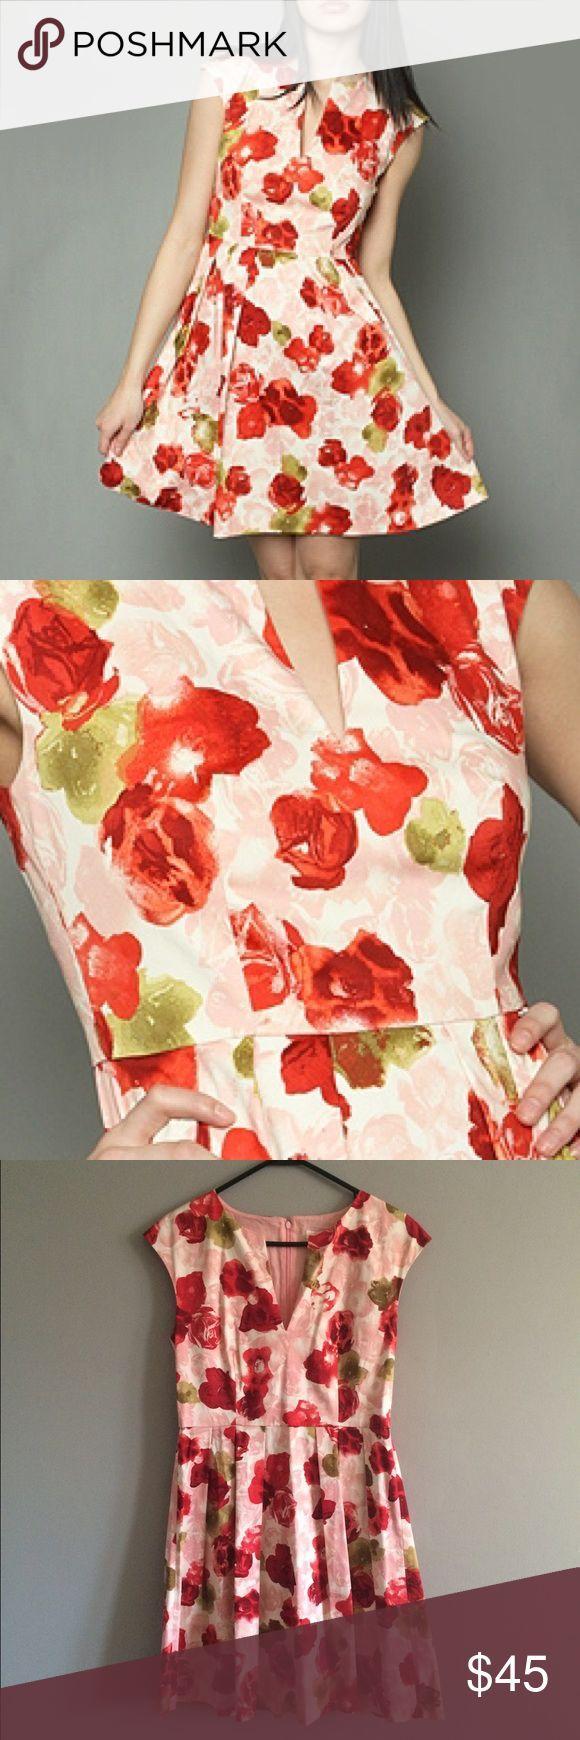 Bb Dakota rose floral dress, 10 EUC BB Dakota dress, size 10. Heavier fabric and really well made. Hidden zipper in back. Reminds me of an Emily and Fin dress. ModCloth Dresses